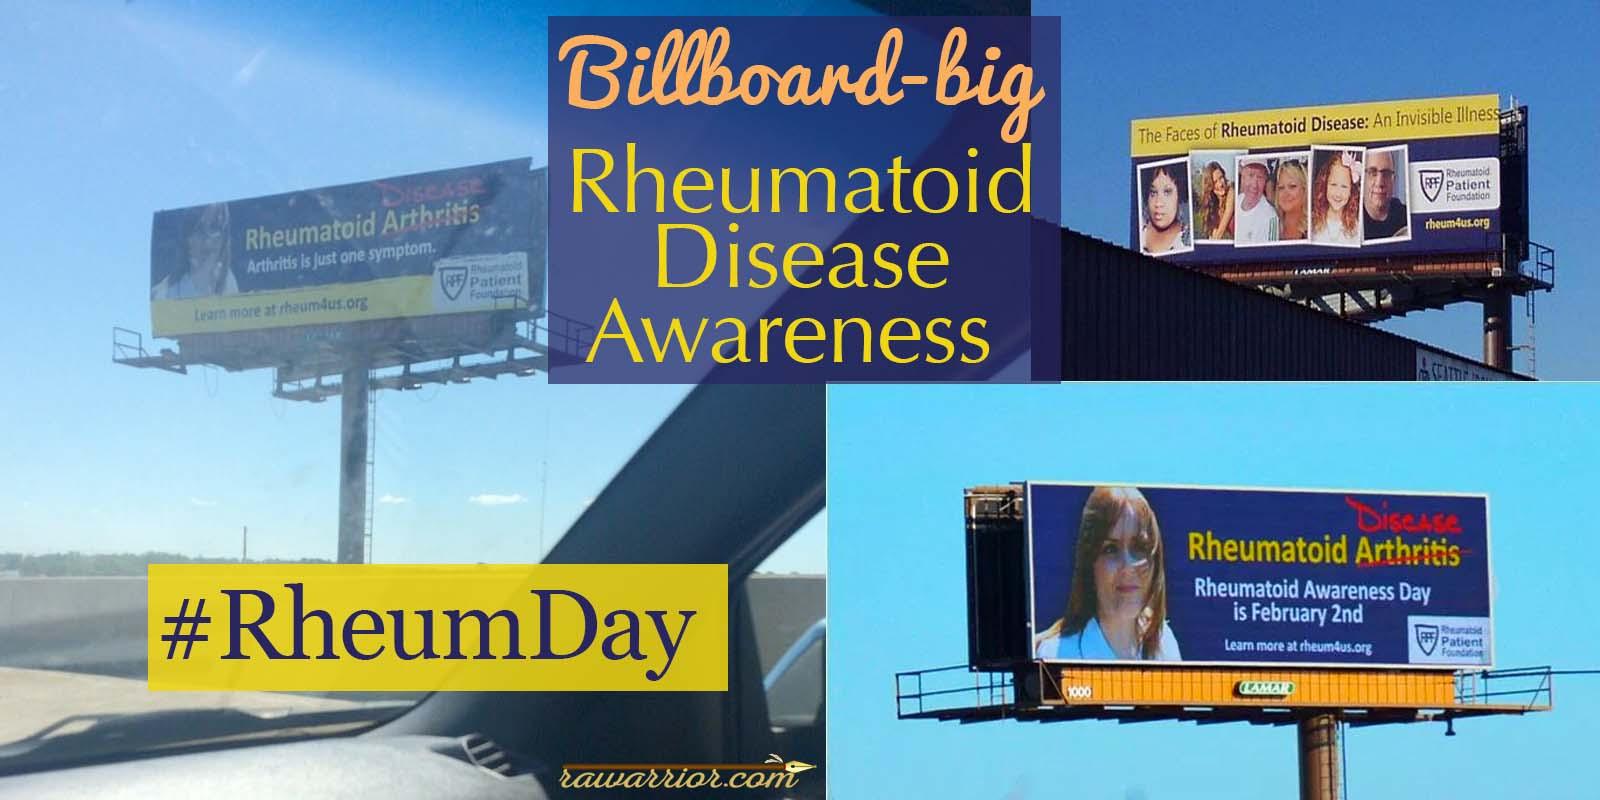 Rheumatoid Disease Awareness Expands